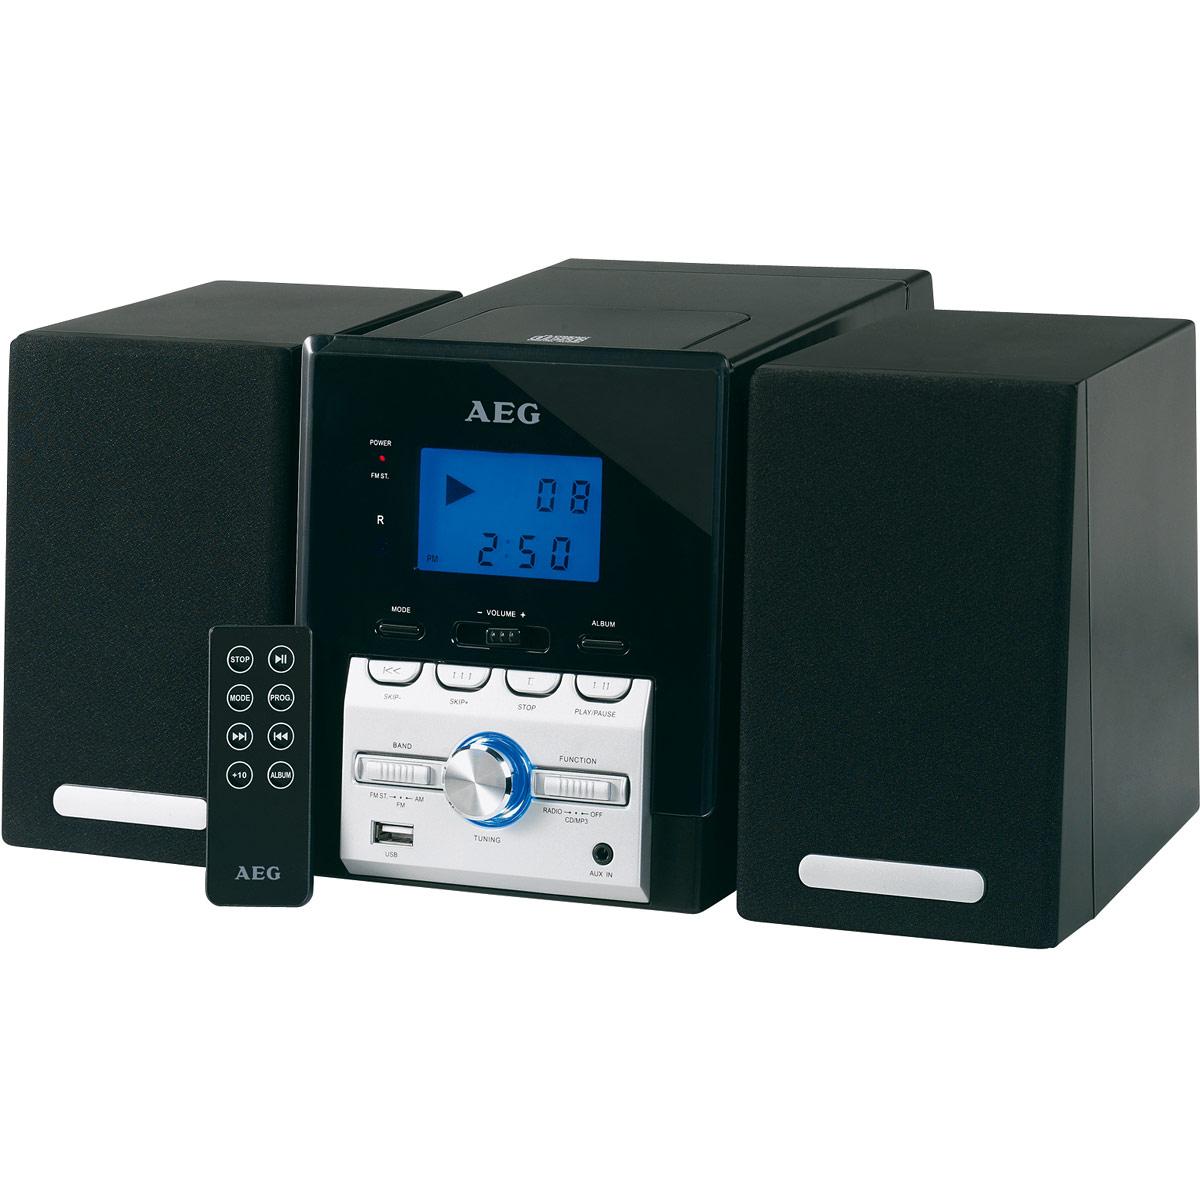 AEG MC 4443, Black микросистема